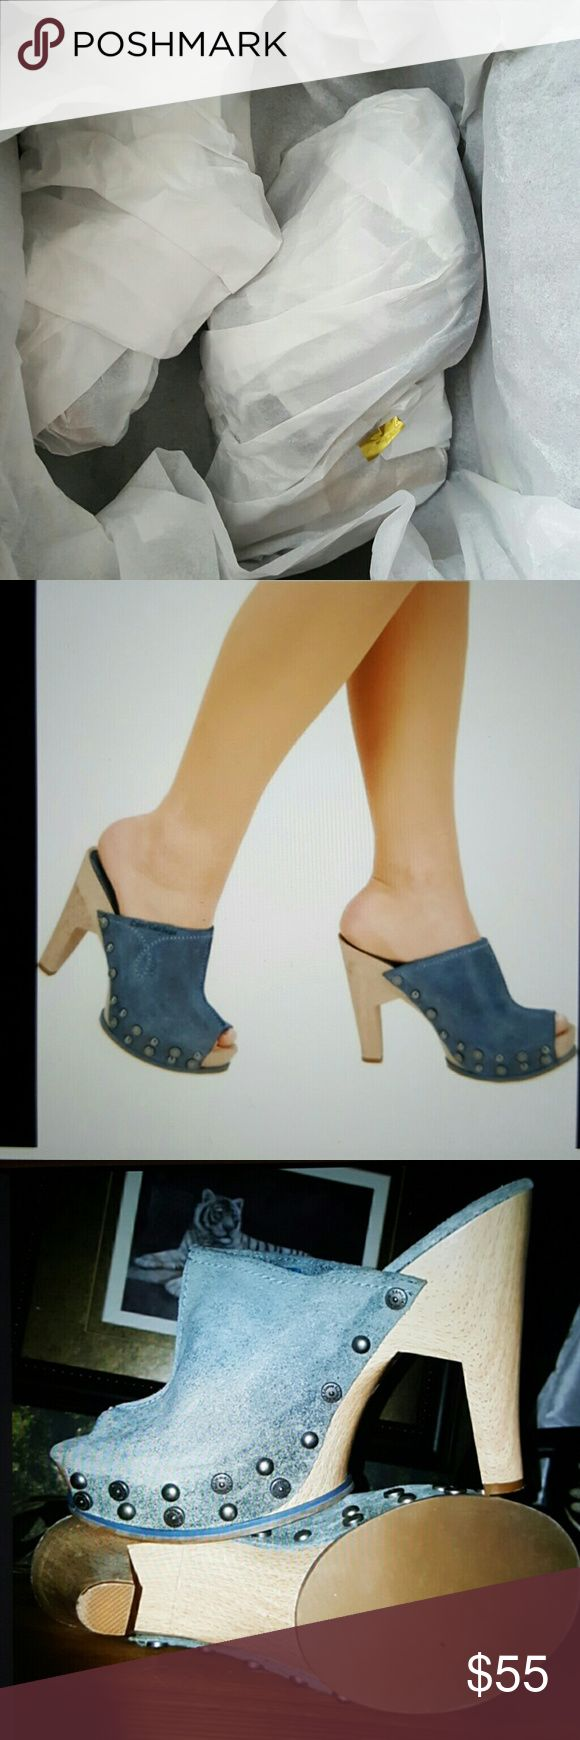 "RESERVED FOR TANEA💐CALVIN KLEIN JEANS CLOGS SZ 8M SALE CALVIN KLEIN JEANS CLOGS SZ 8M leather color blue beautiful  suede heel 4.5"" wooden platform 1.5"" silver tone logo stud details Calvin Klein Jeans Shoes Mules & Clogs"